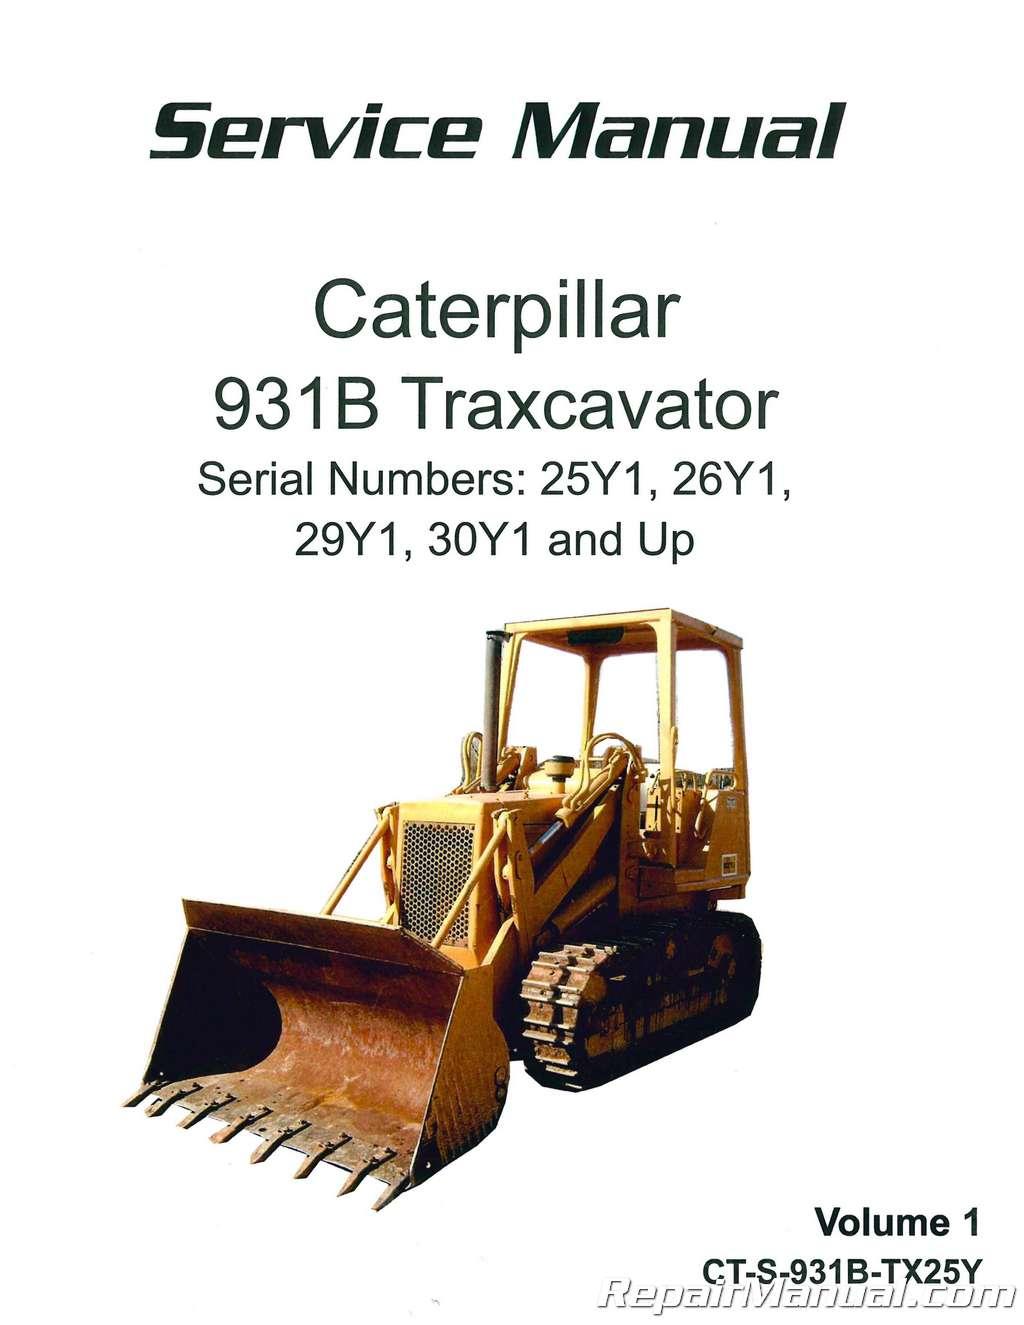 Caterpillar 931B Traxcavator Service Manual